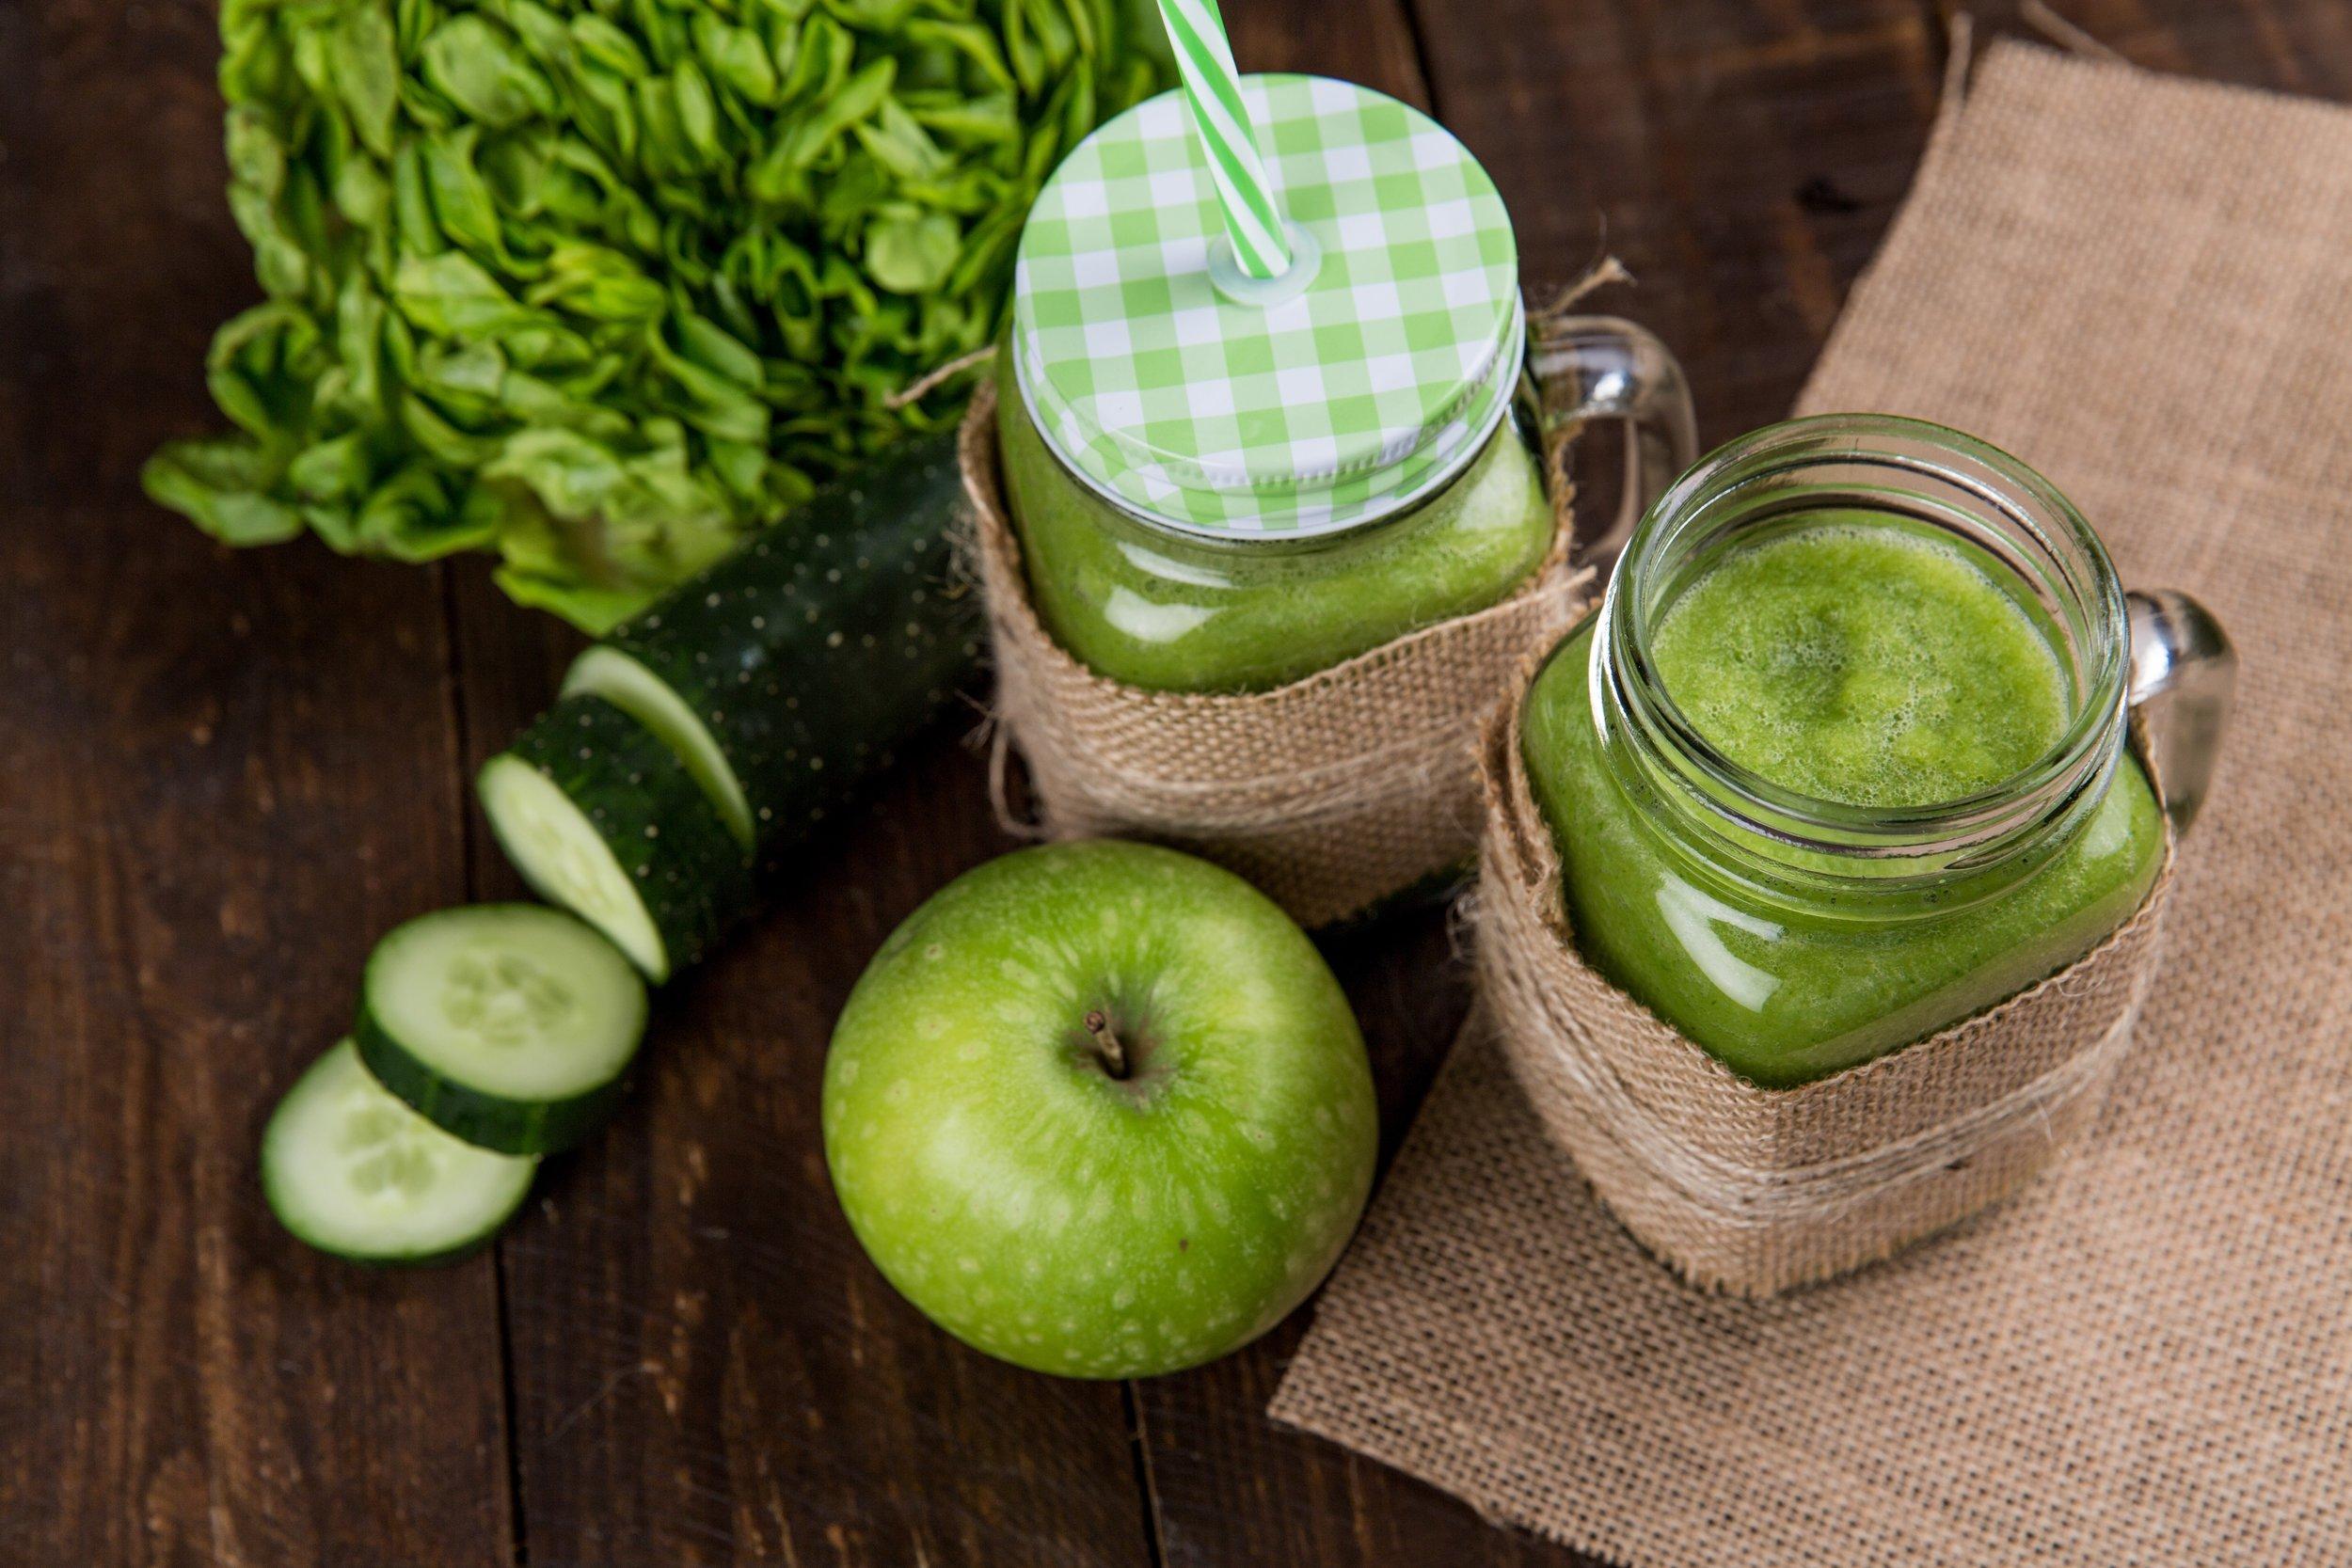 apple-close-up-cucumber-616833.jpg